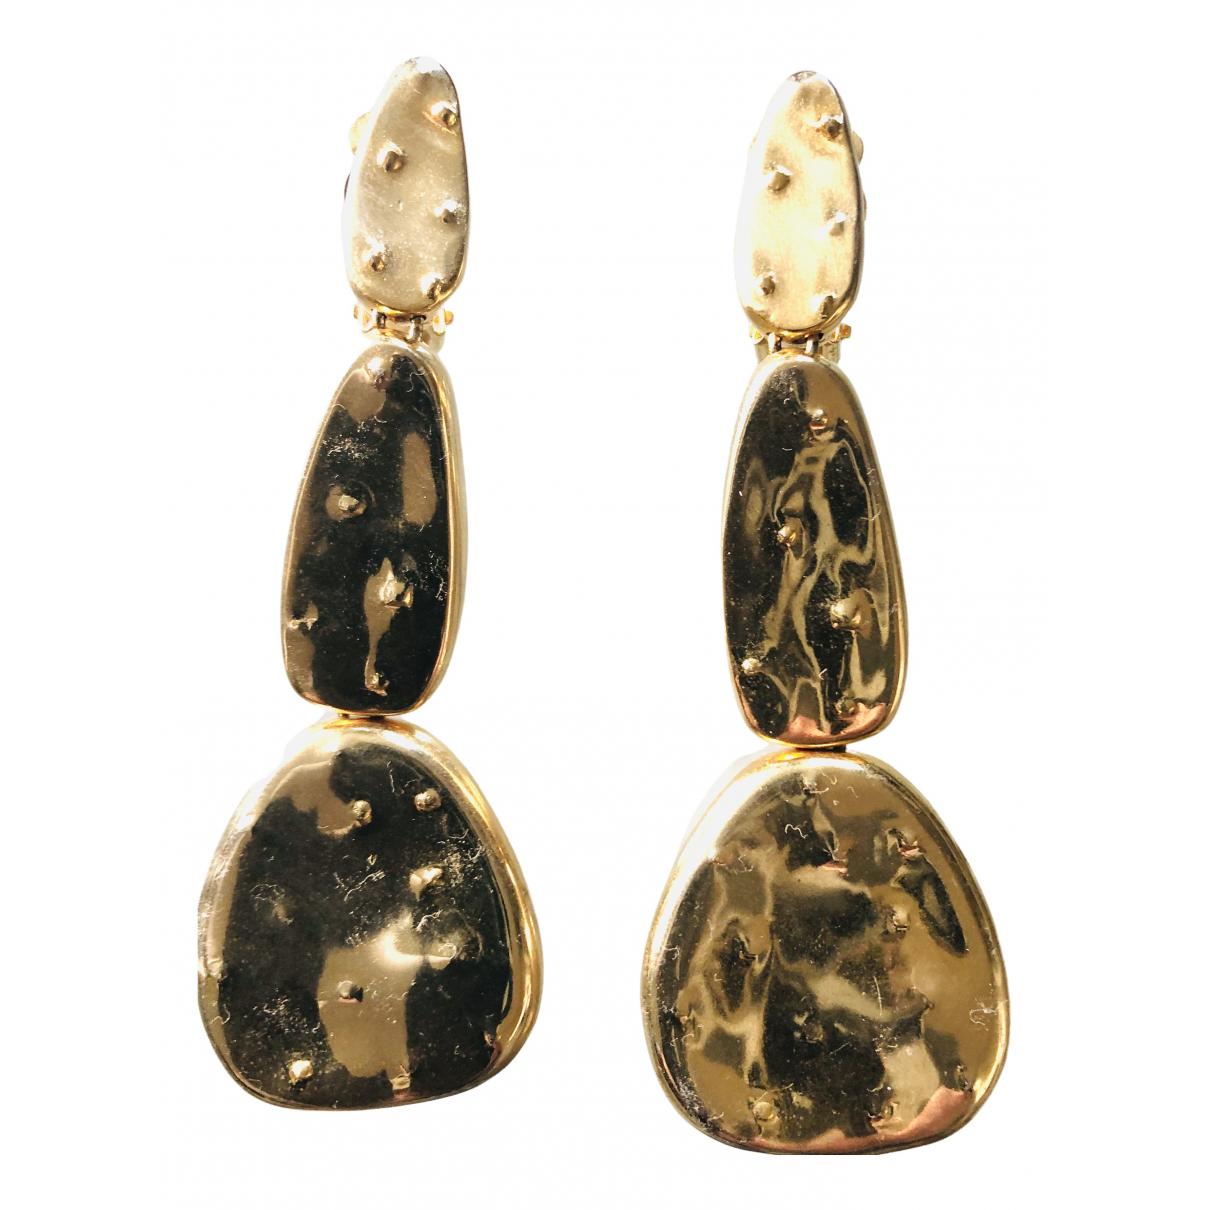 Joelle Kharrat N Gold Gold plated Earrings for Women N